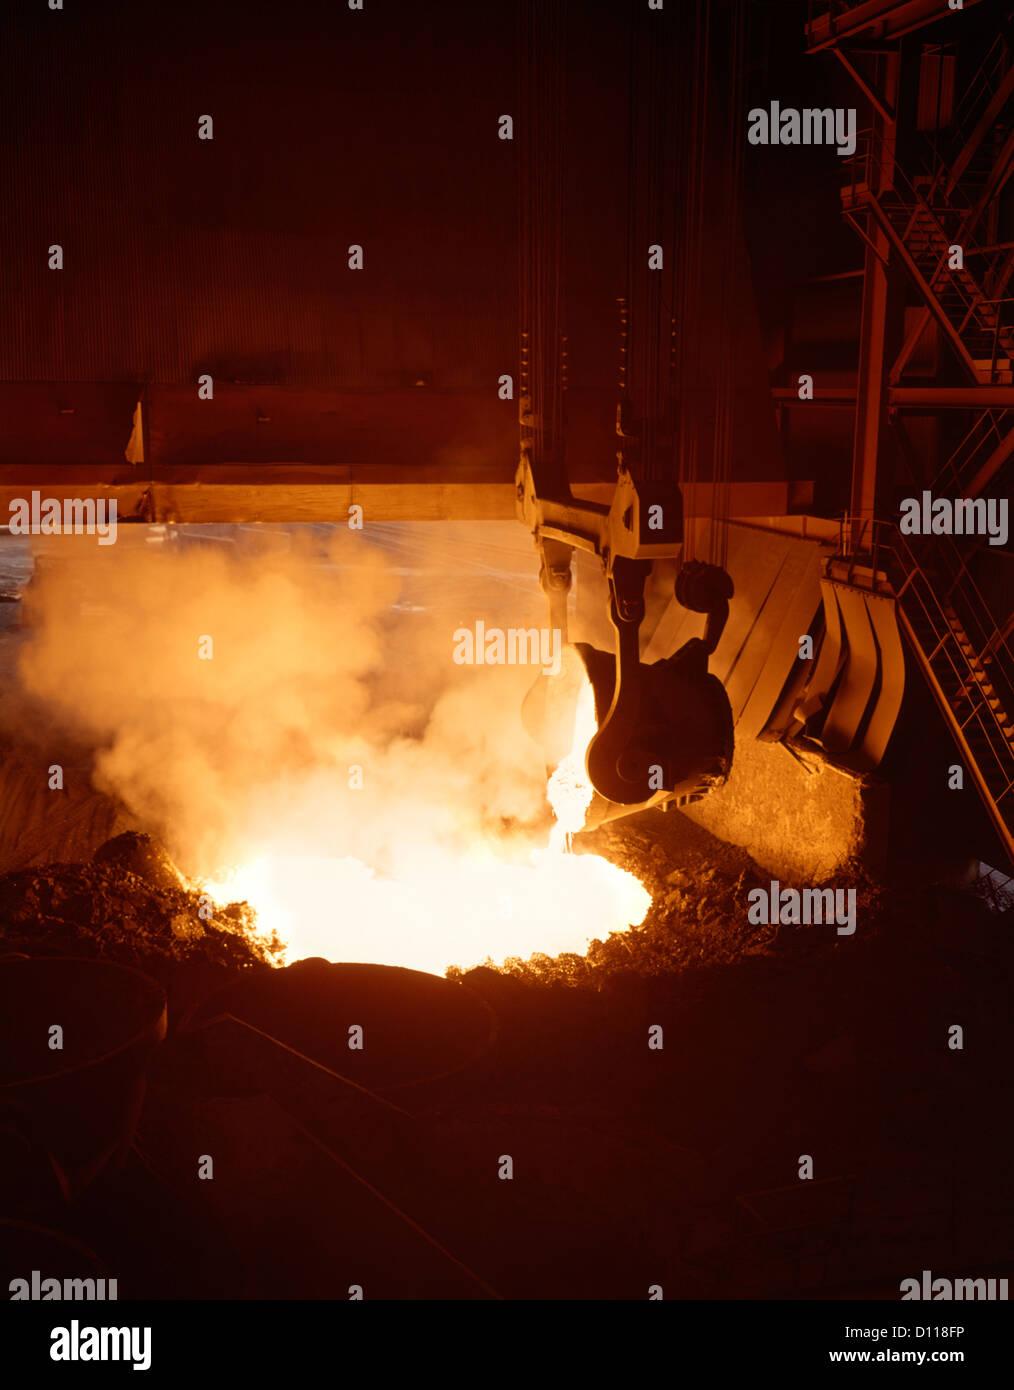 Crucible Steel Stock Photos & Crucible Steel Stock Images - Alamy